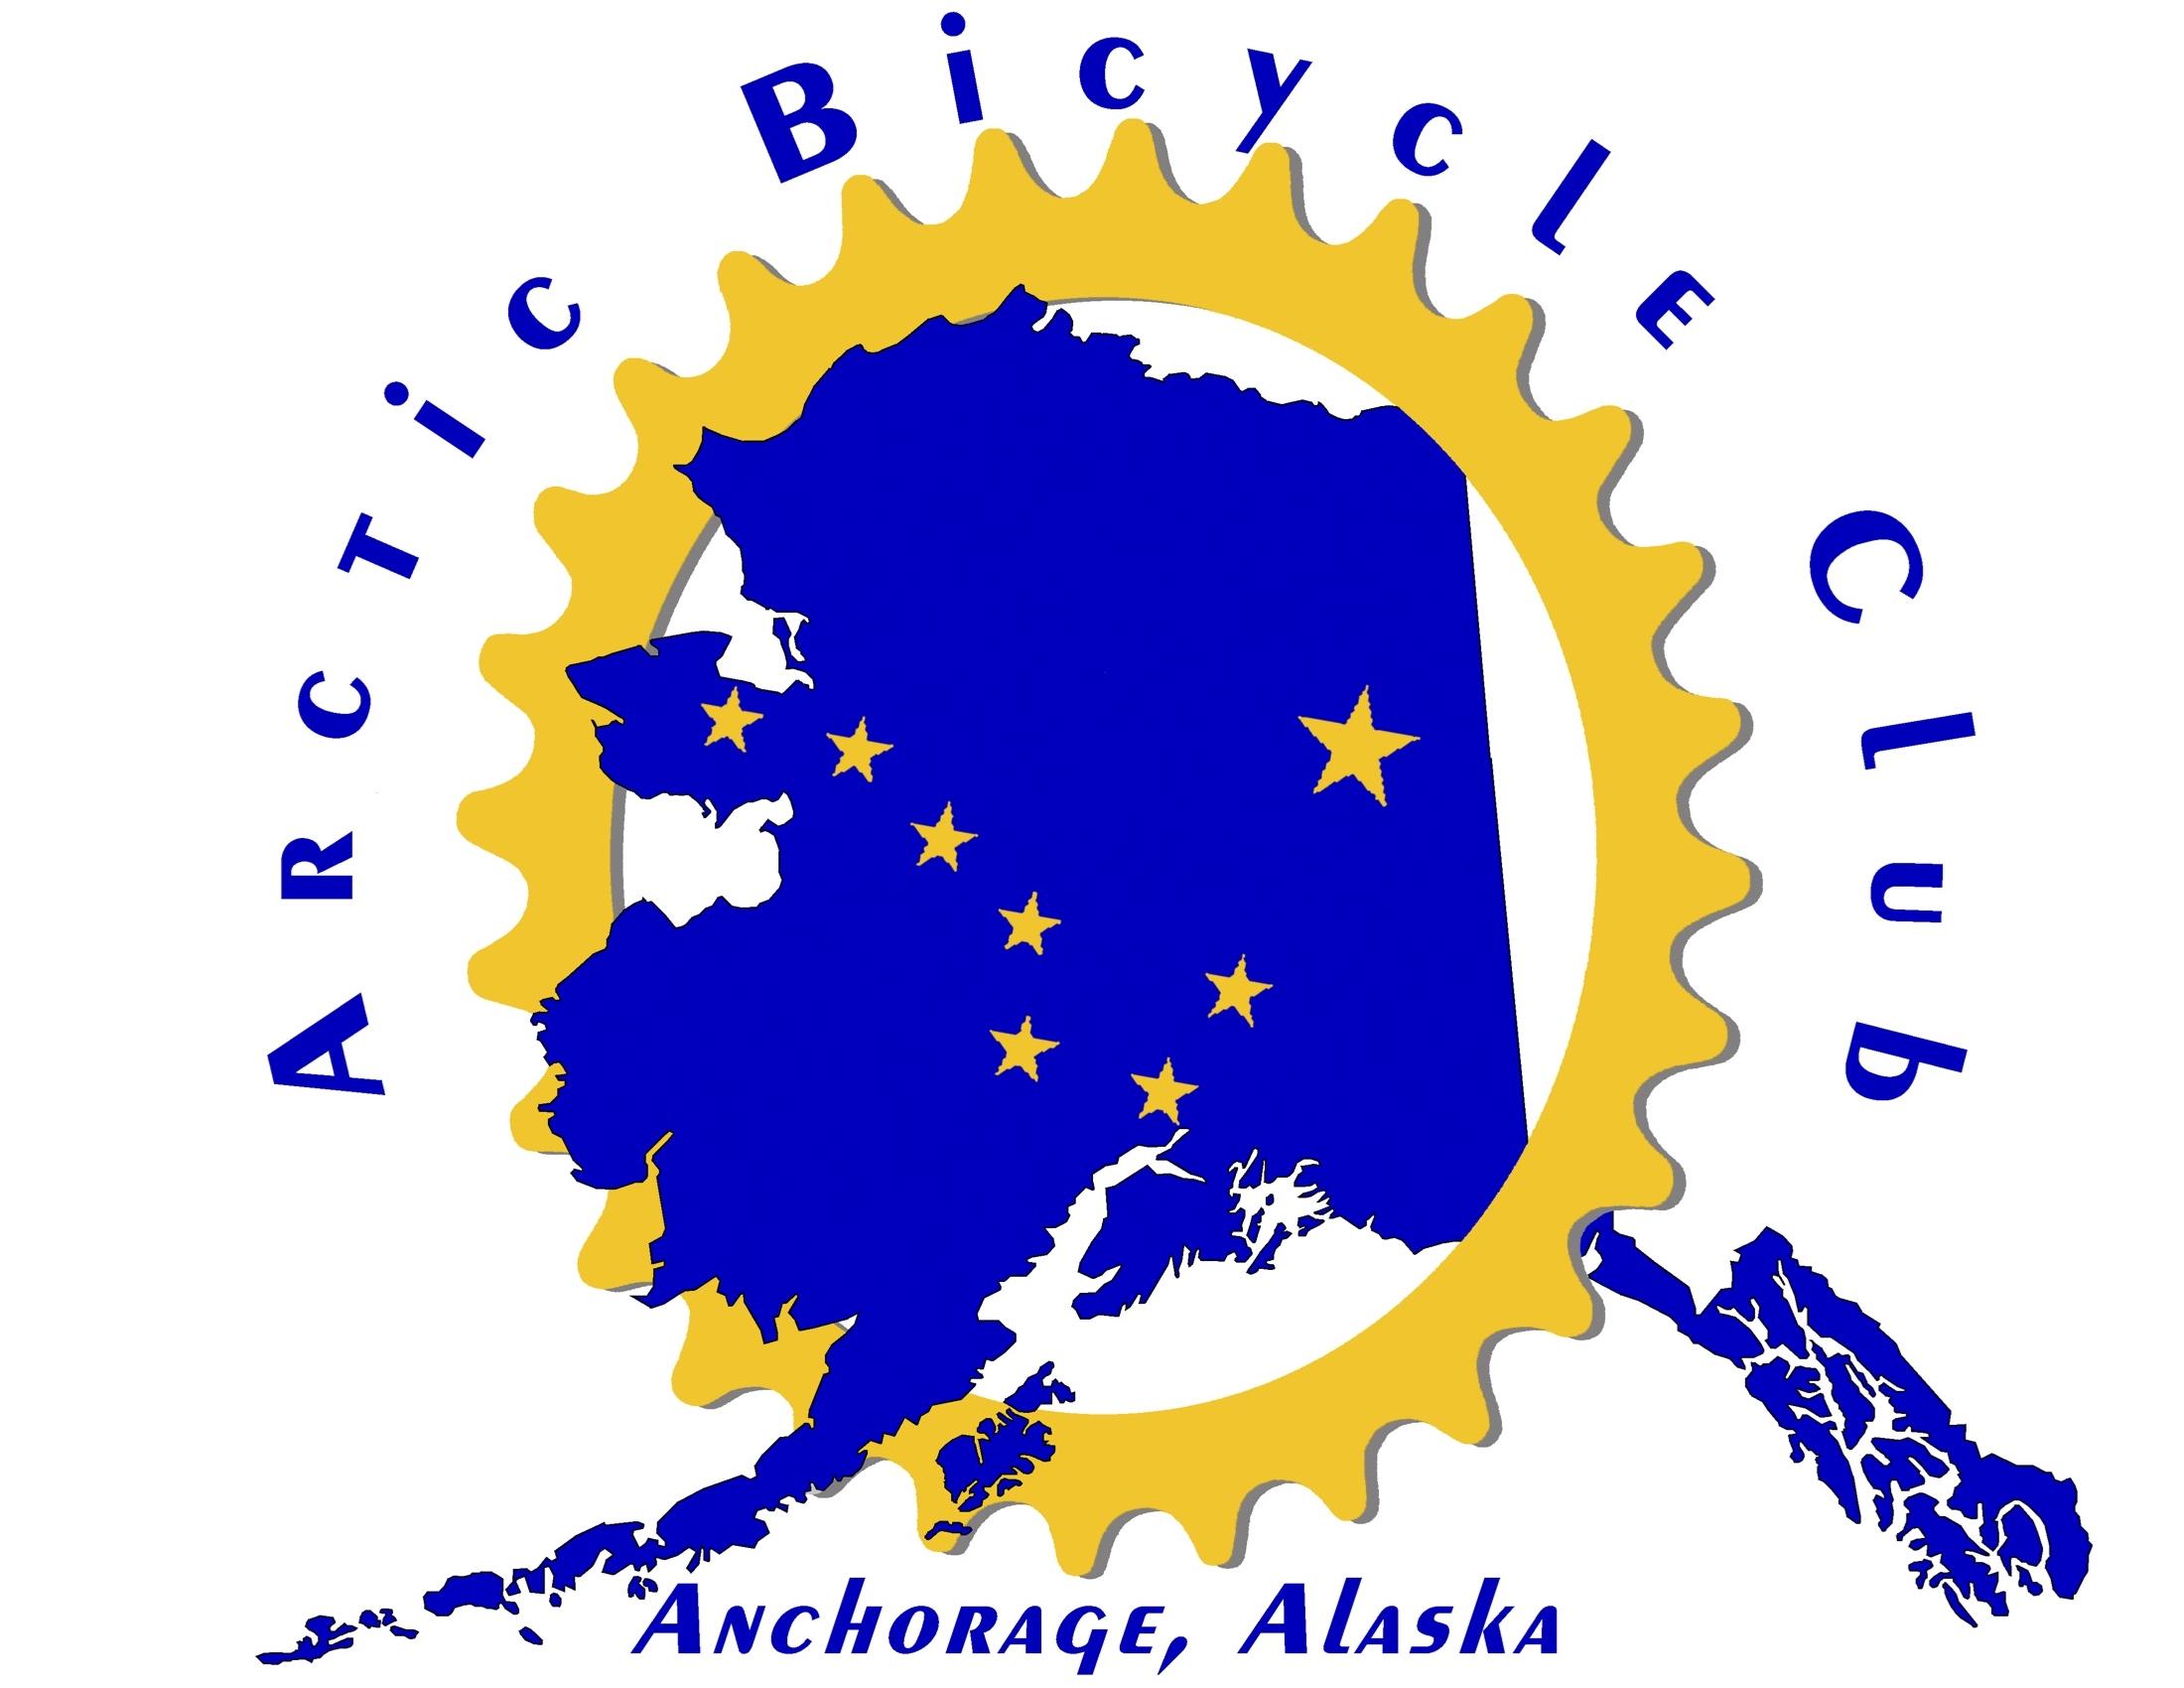 Arctic Bicycle Club